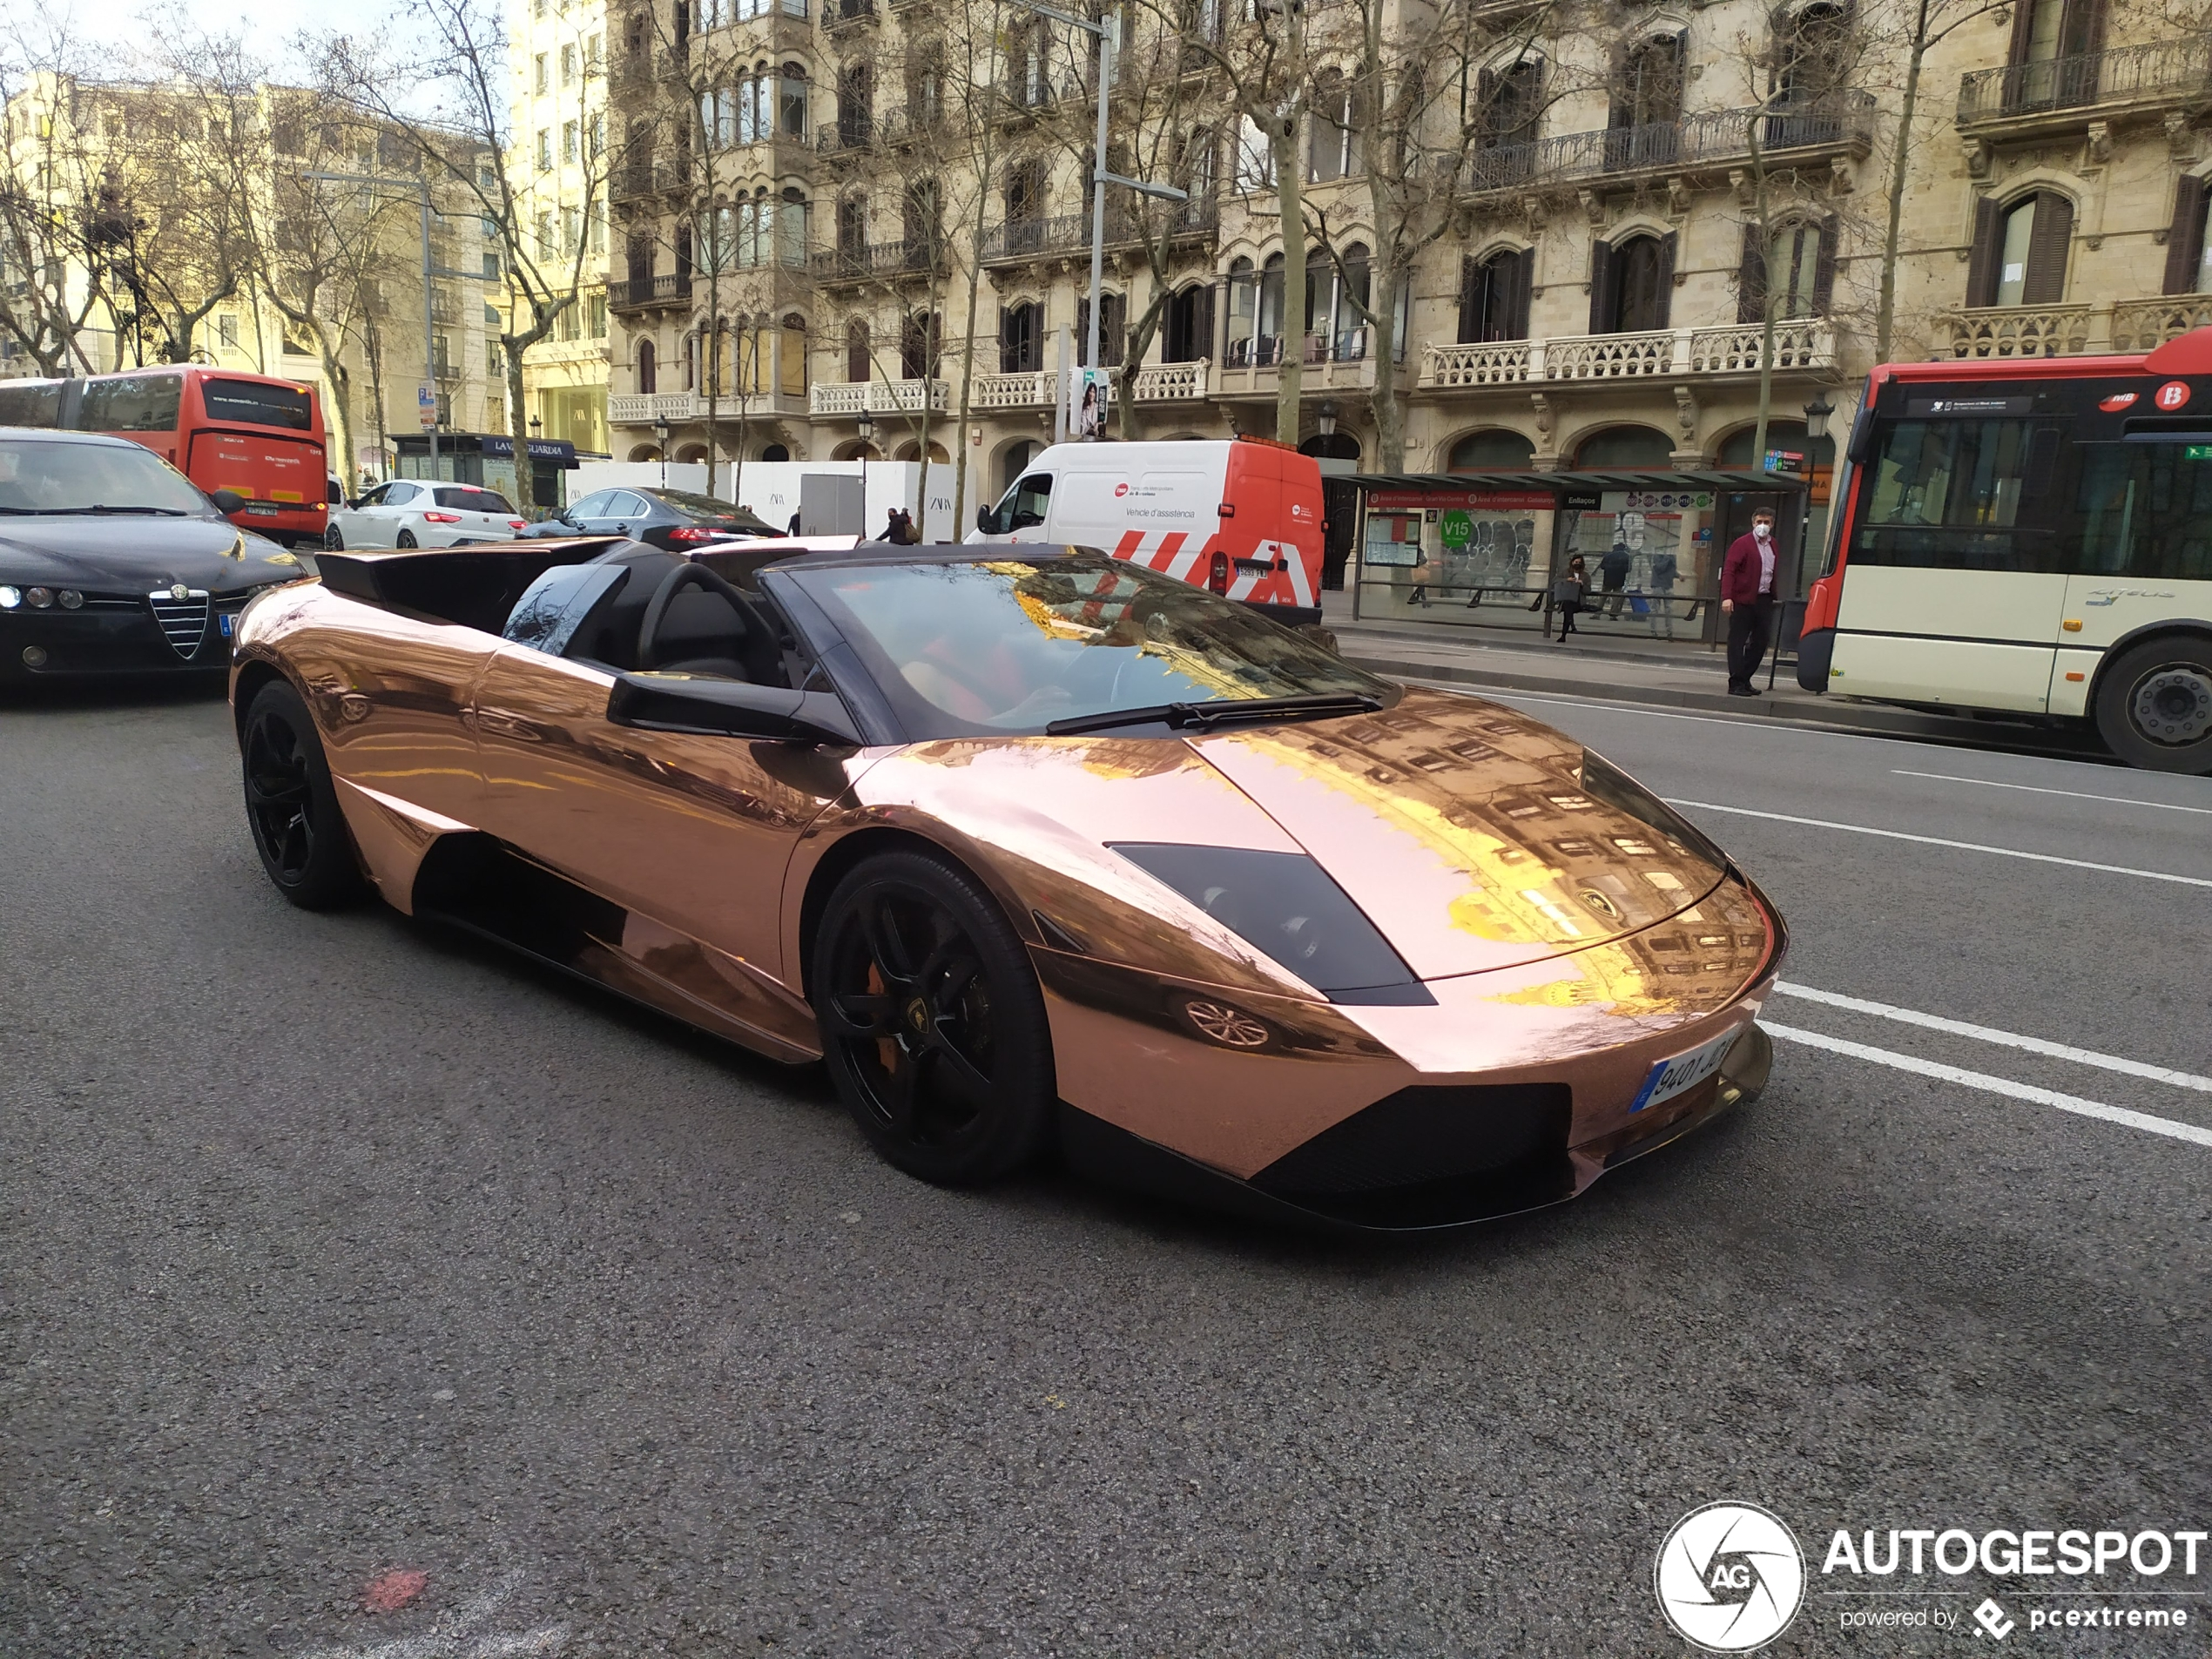 Lamborghini Murciélago LP640 Roadster rijdt er lekker bij